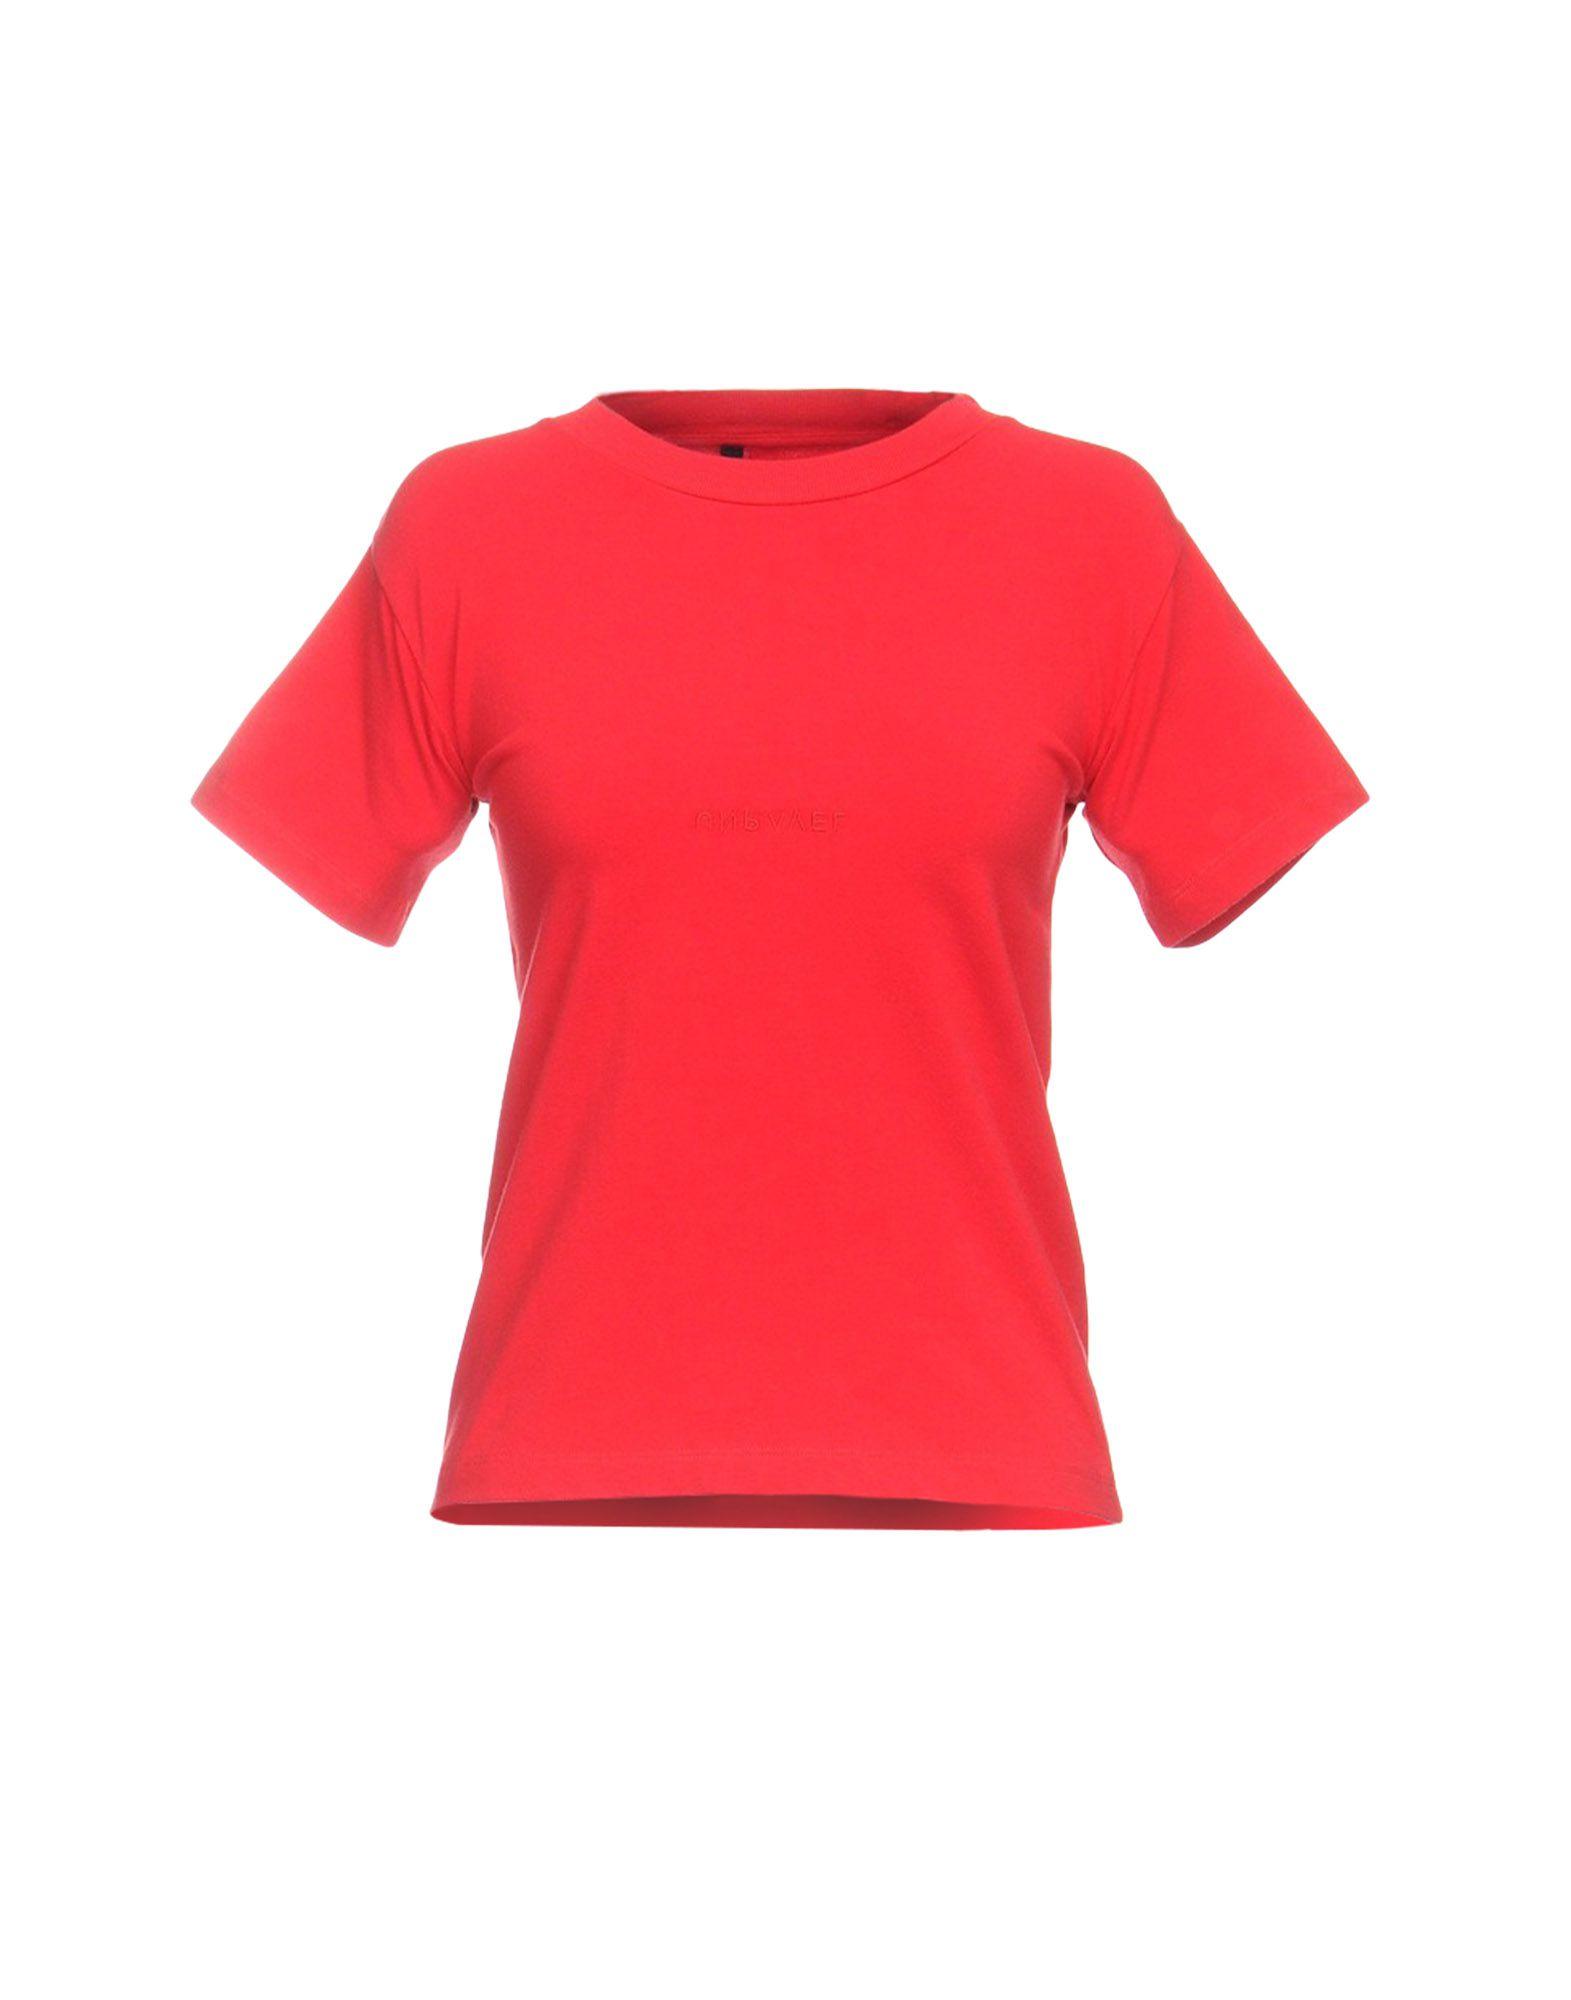 T-Shirt Ben Taverniti™ Unravel Project Donna - Acquista online su V1dILC